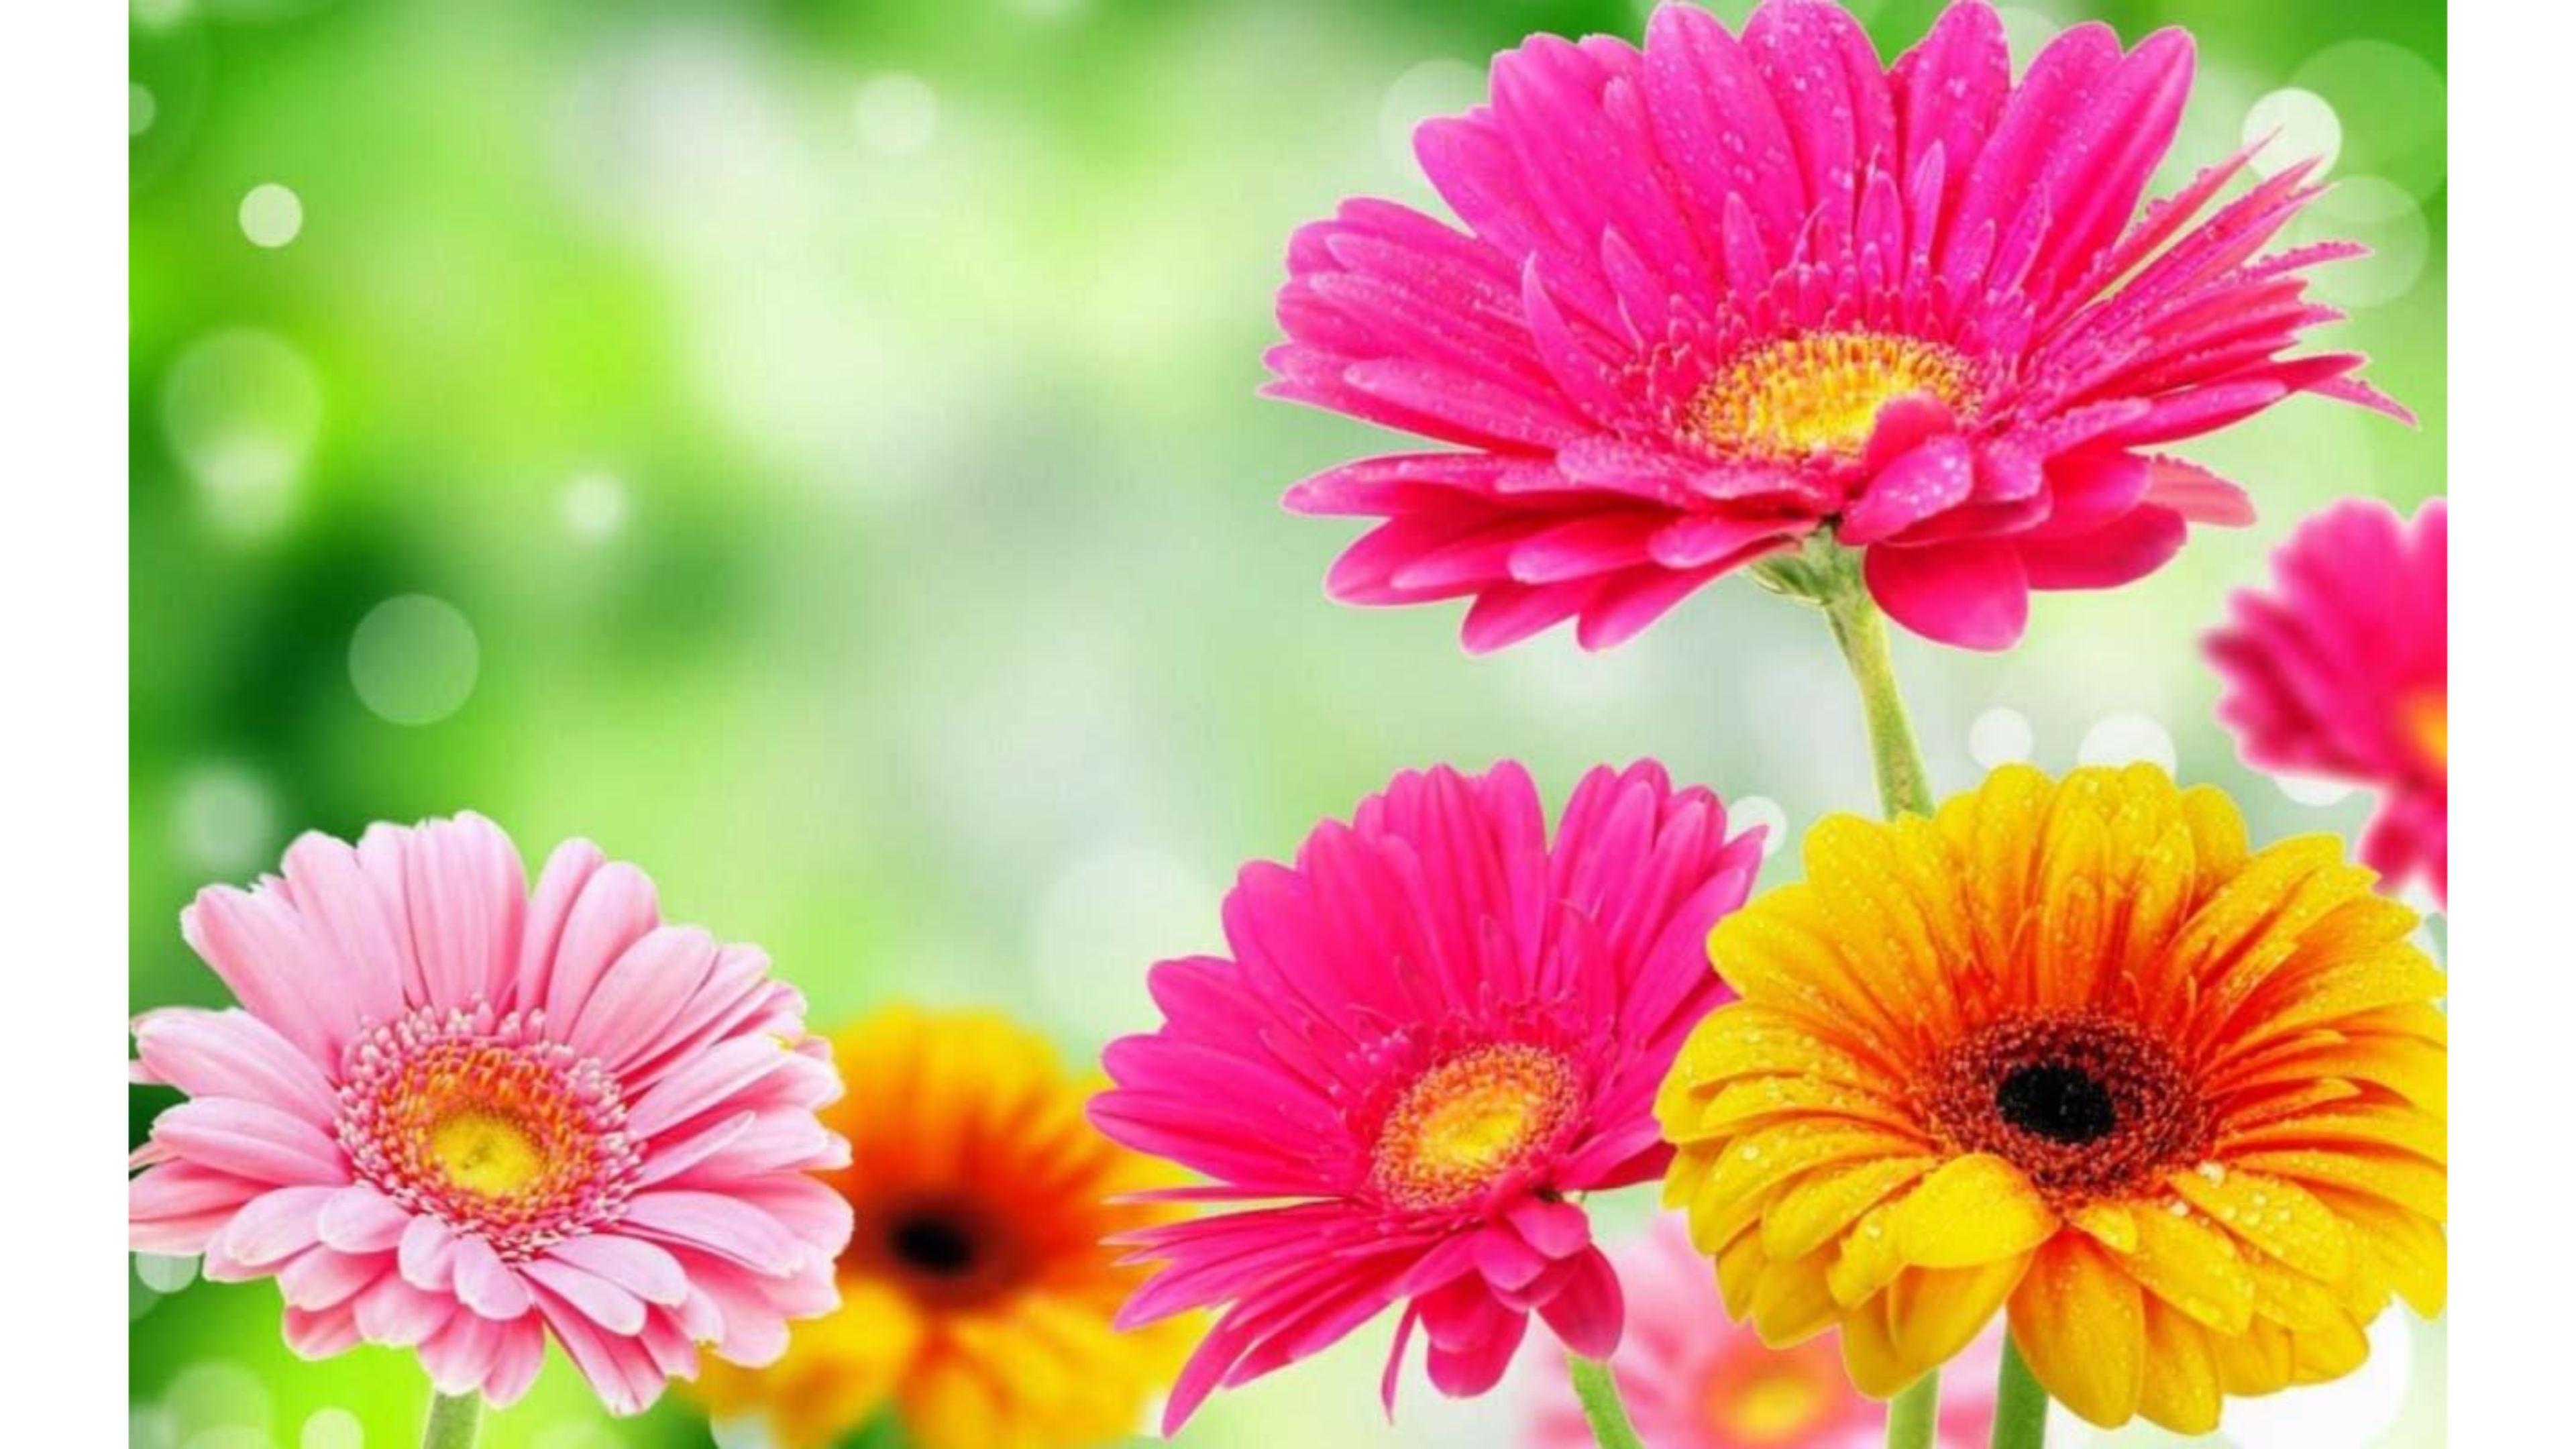 Res: 3840x2160, Beautiful 4K Spring Wallpaper